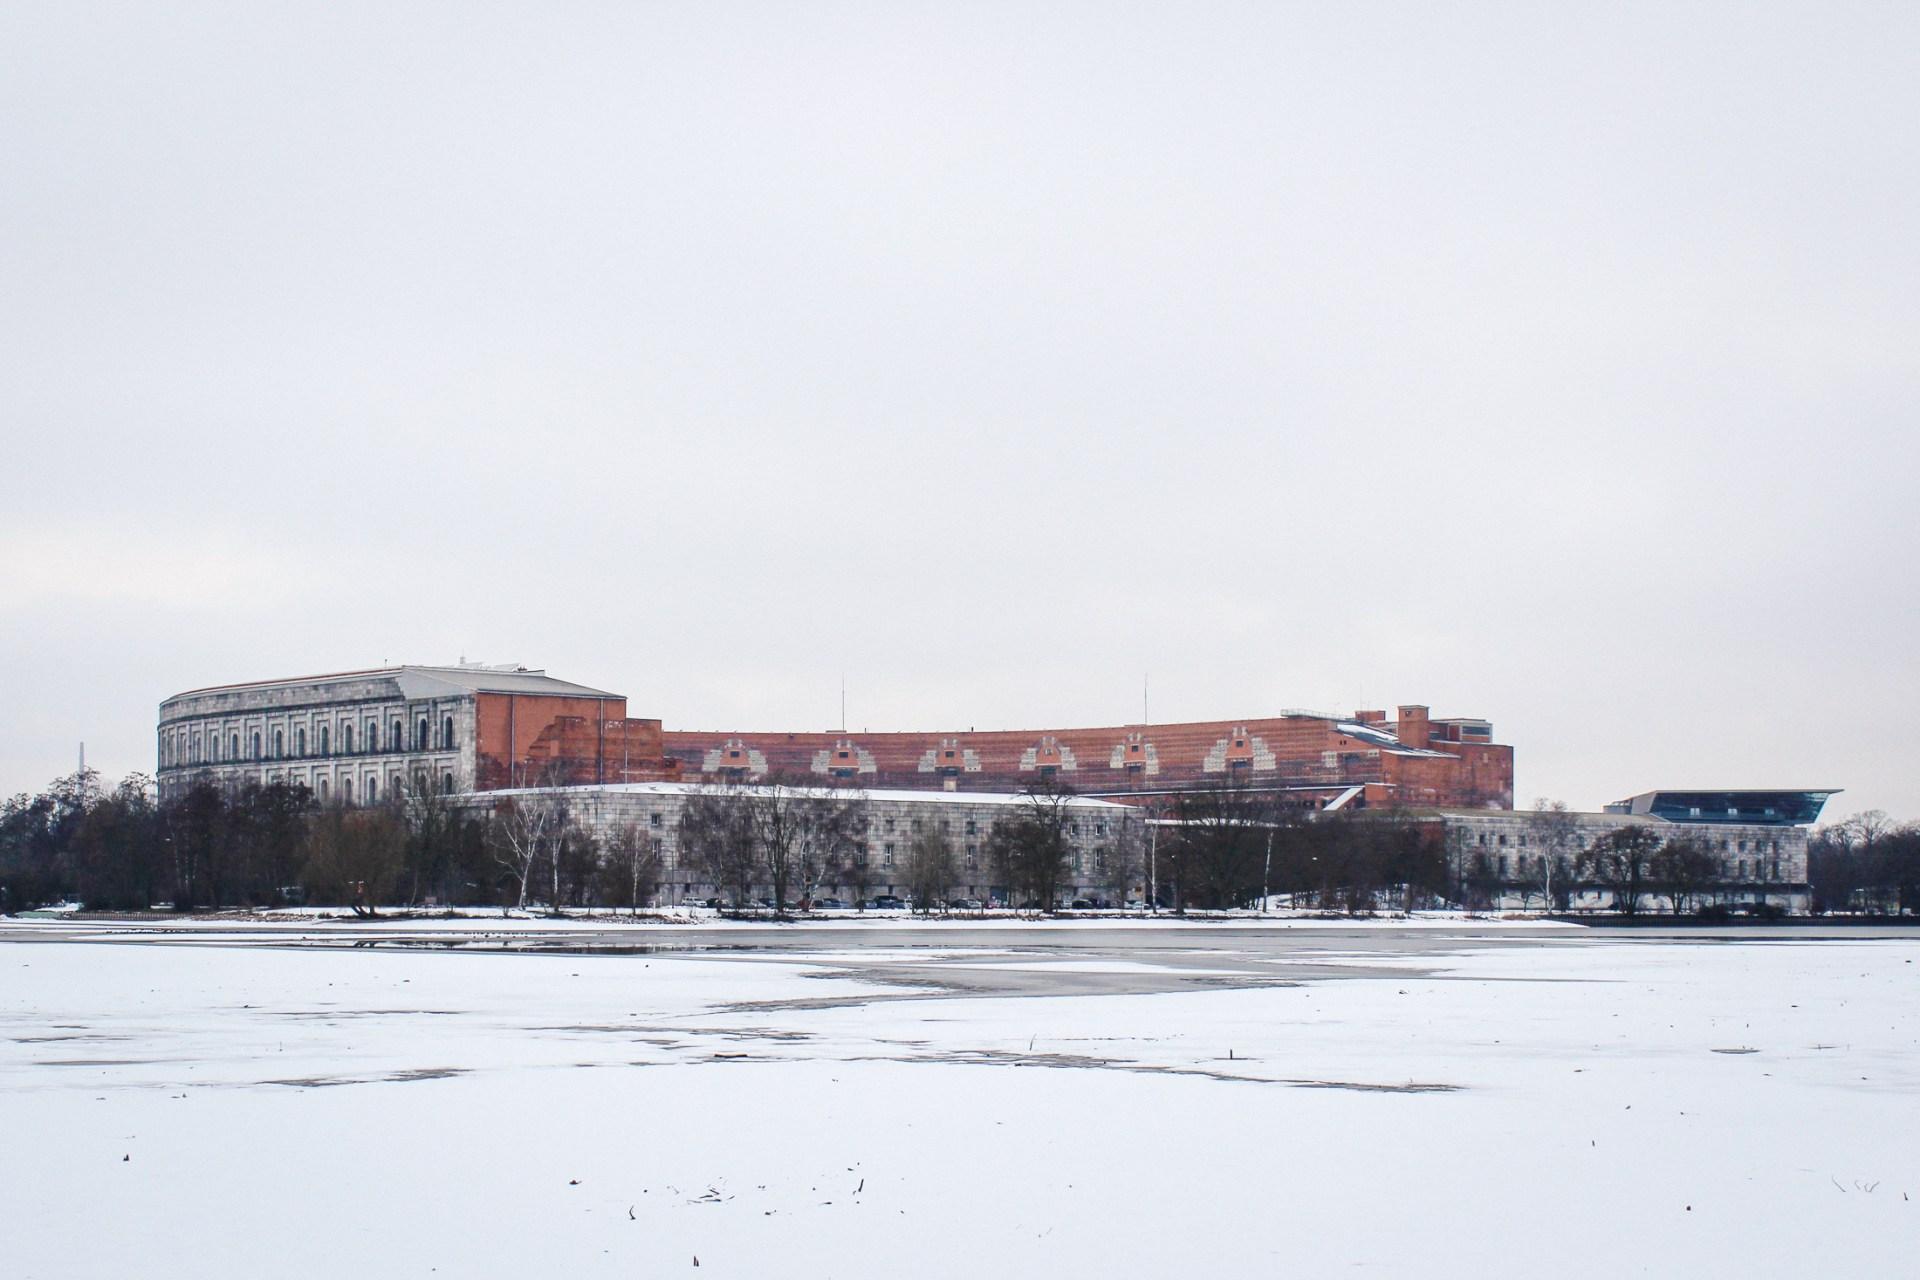 Visiting the Nuremberg Nazi Rally Grounds